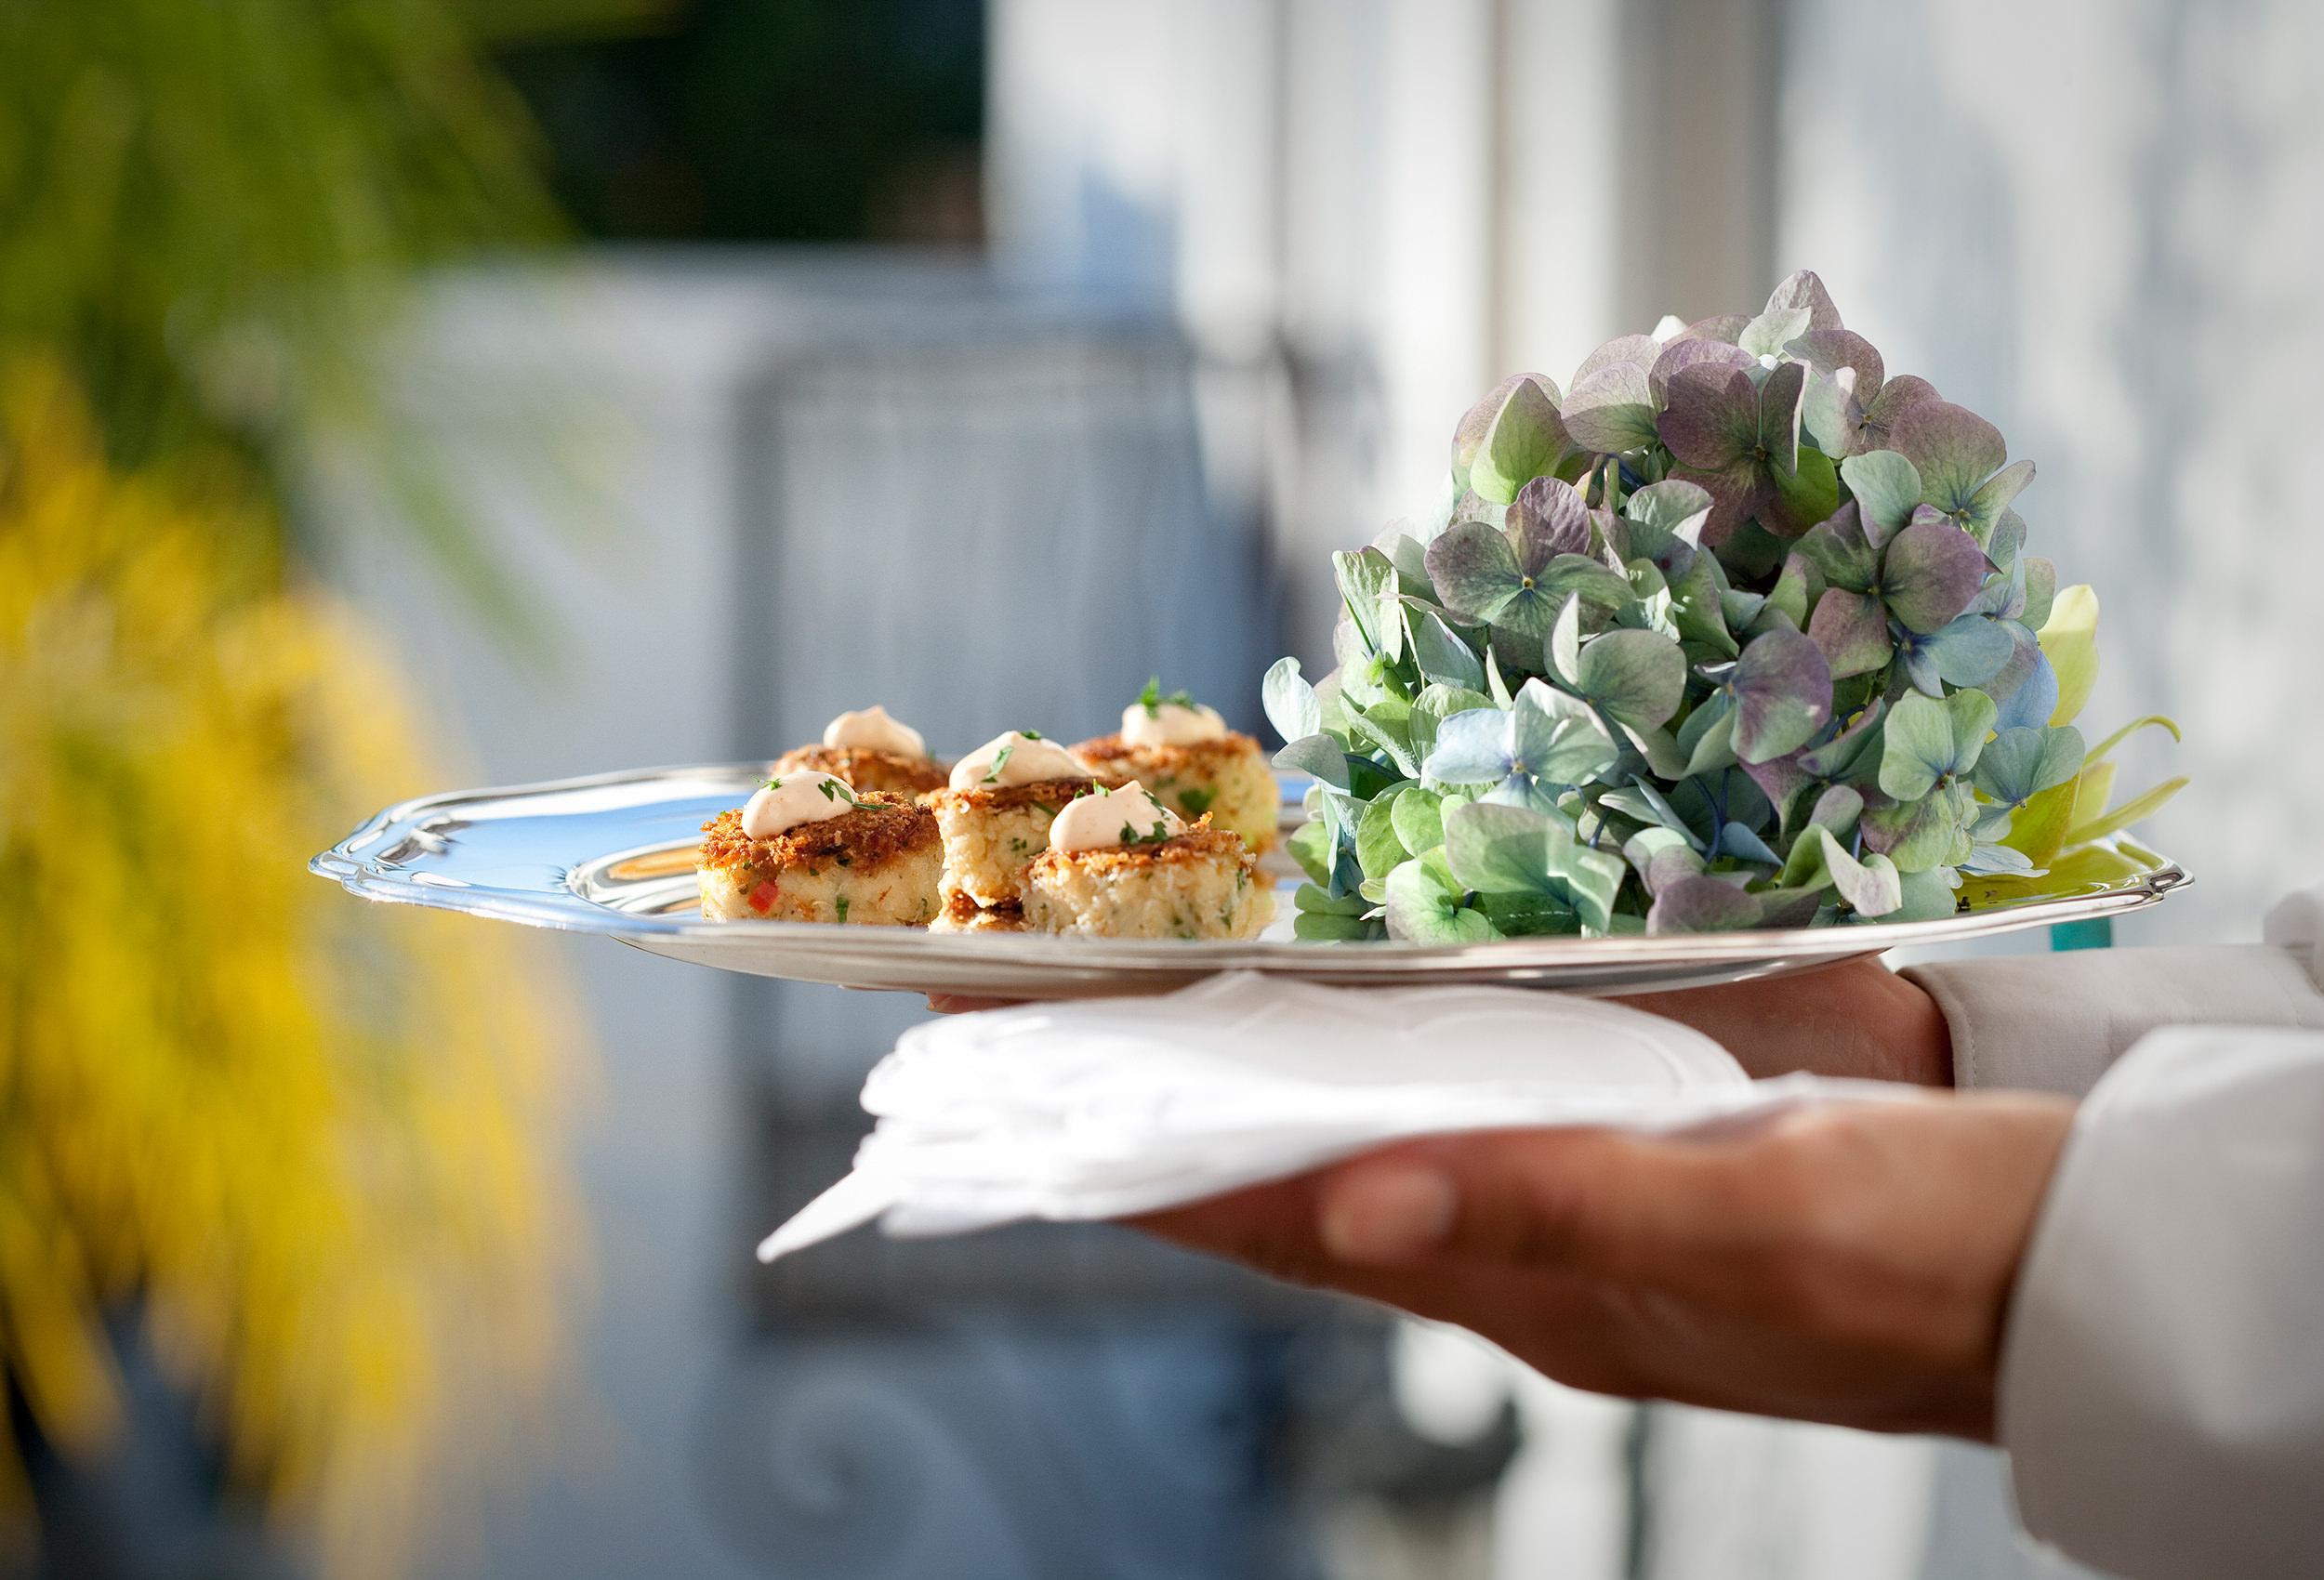 Gaszton_Hotel_Resort_Photographe_Food_0374.jpg